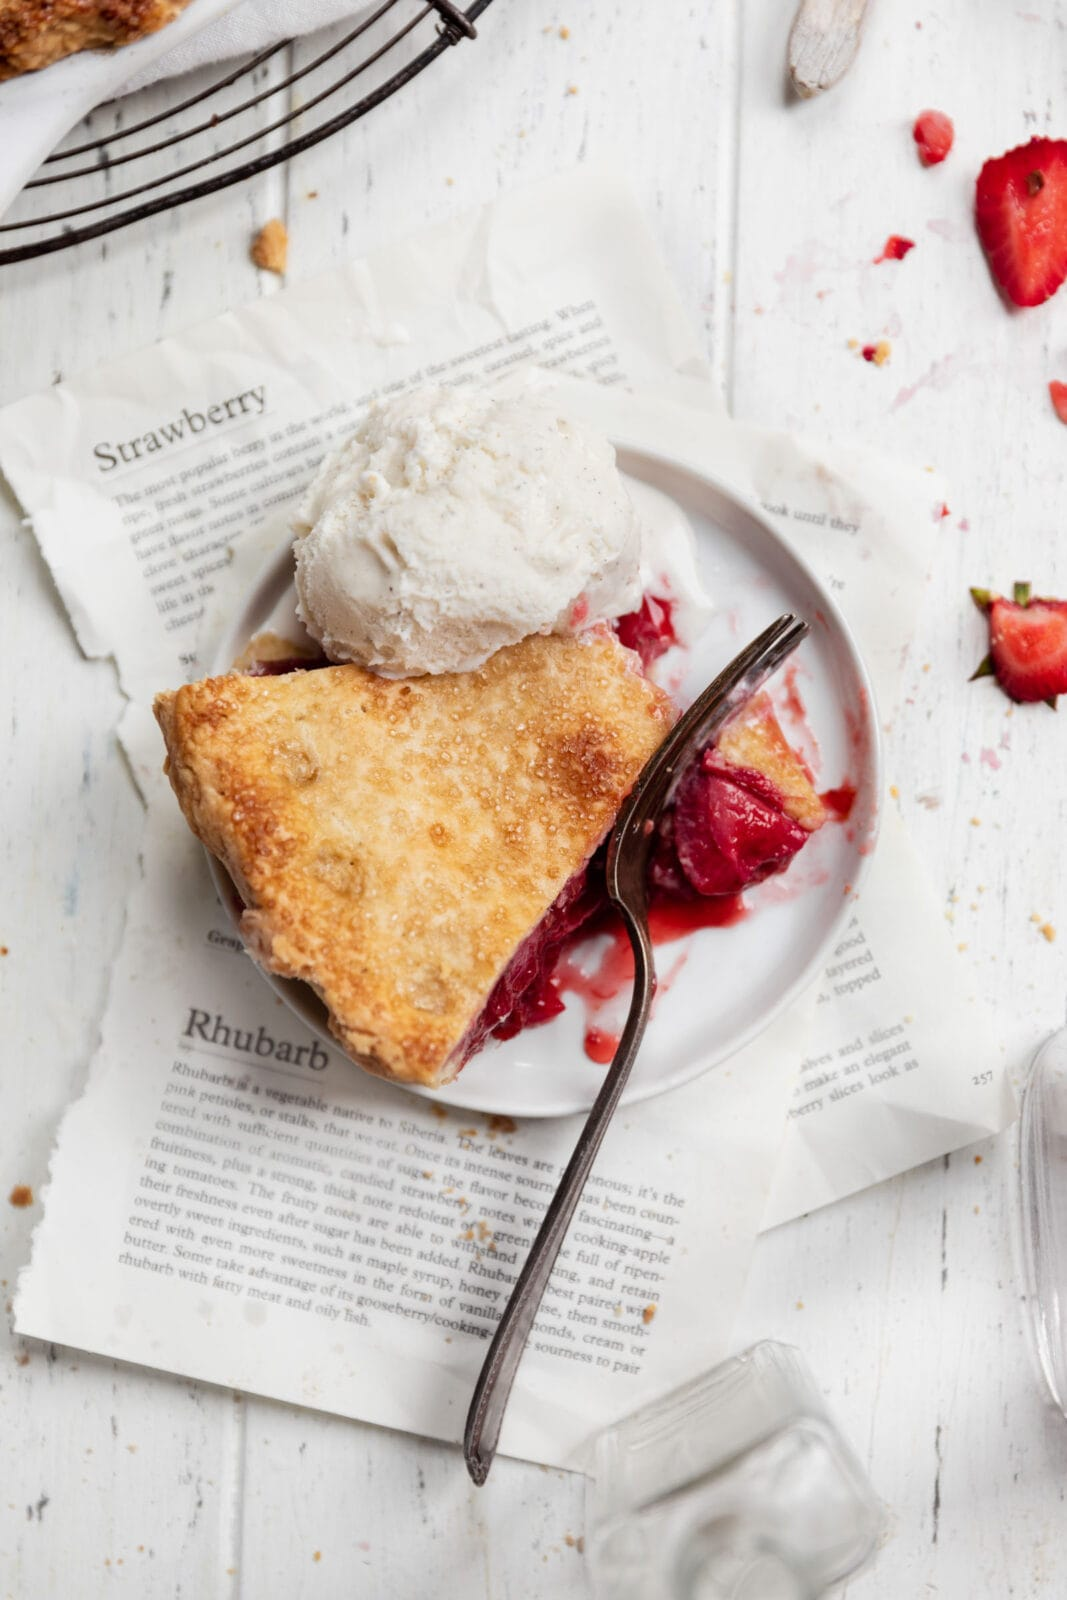 szelet eper rebarbara pite fagylalttal